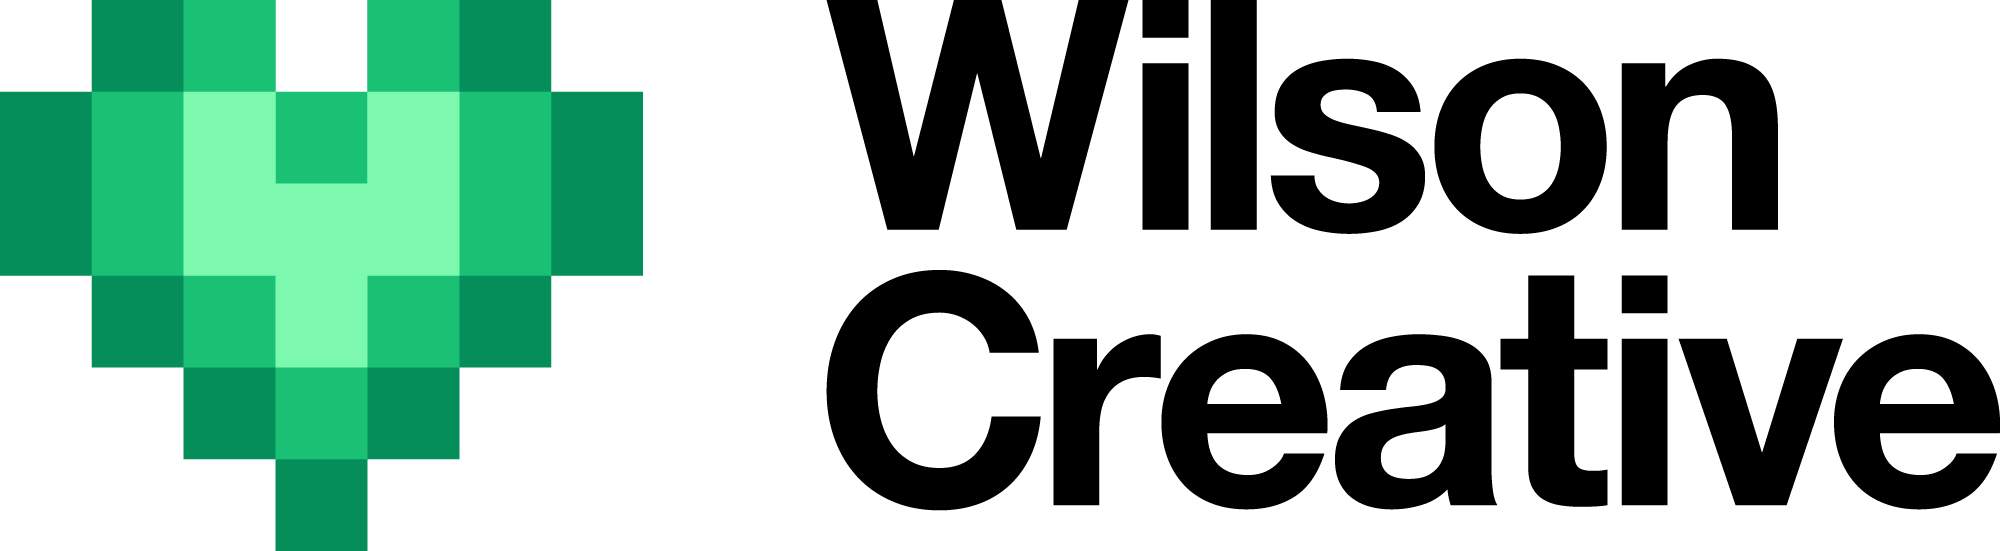 wilson_2019_logo_helvetica_pos